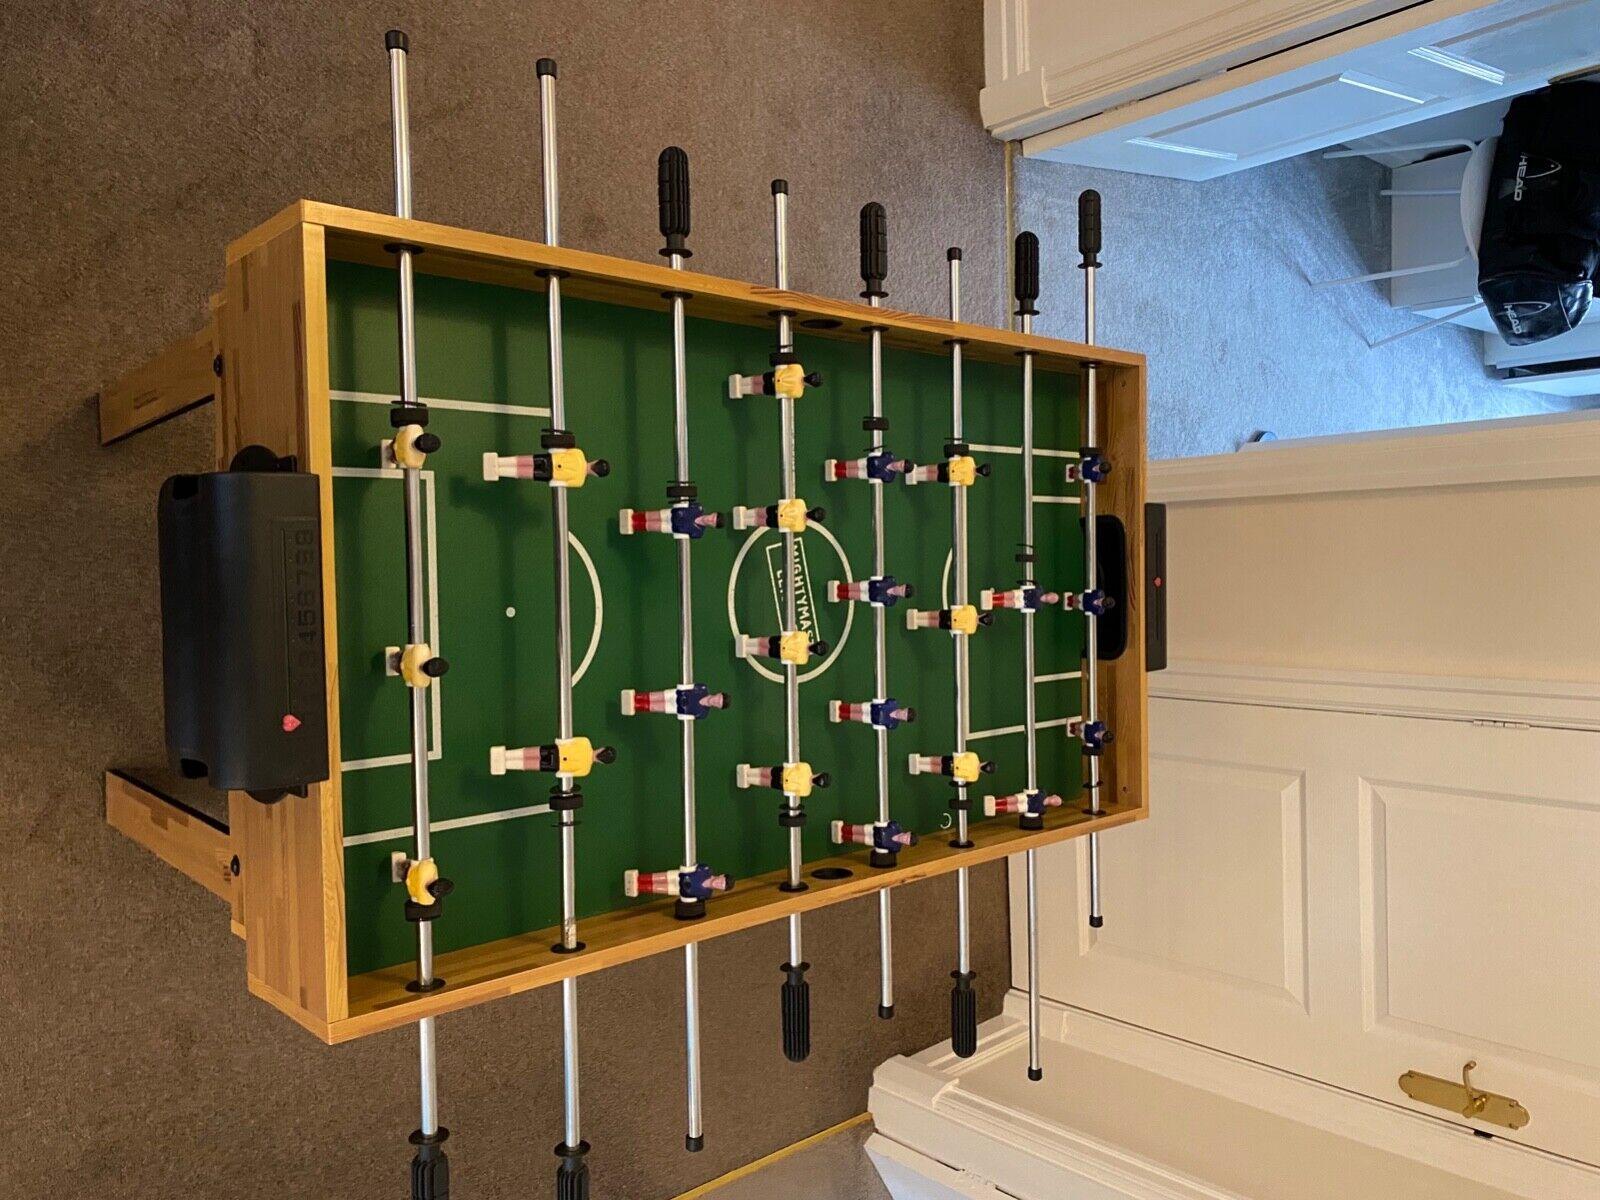 Mini Table Football and Pool Table